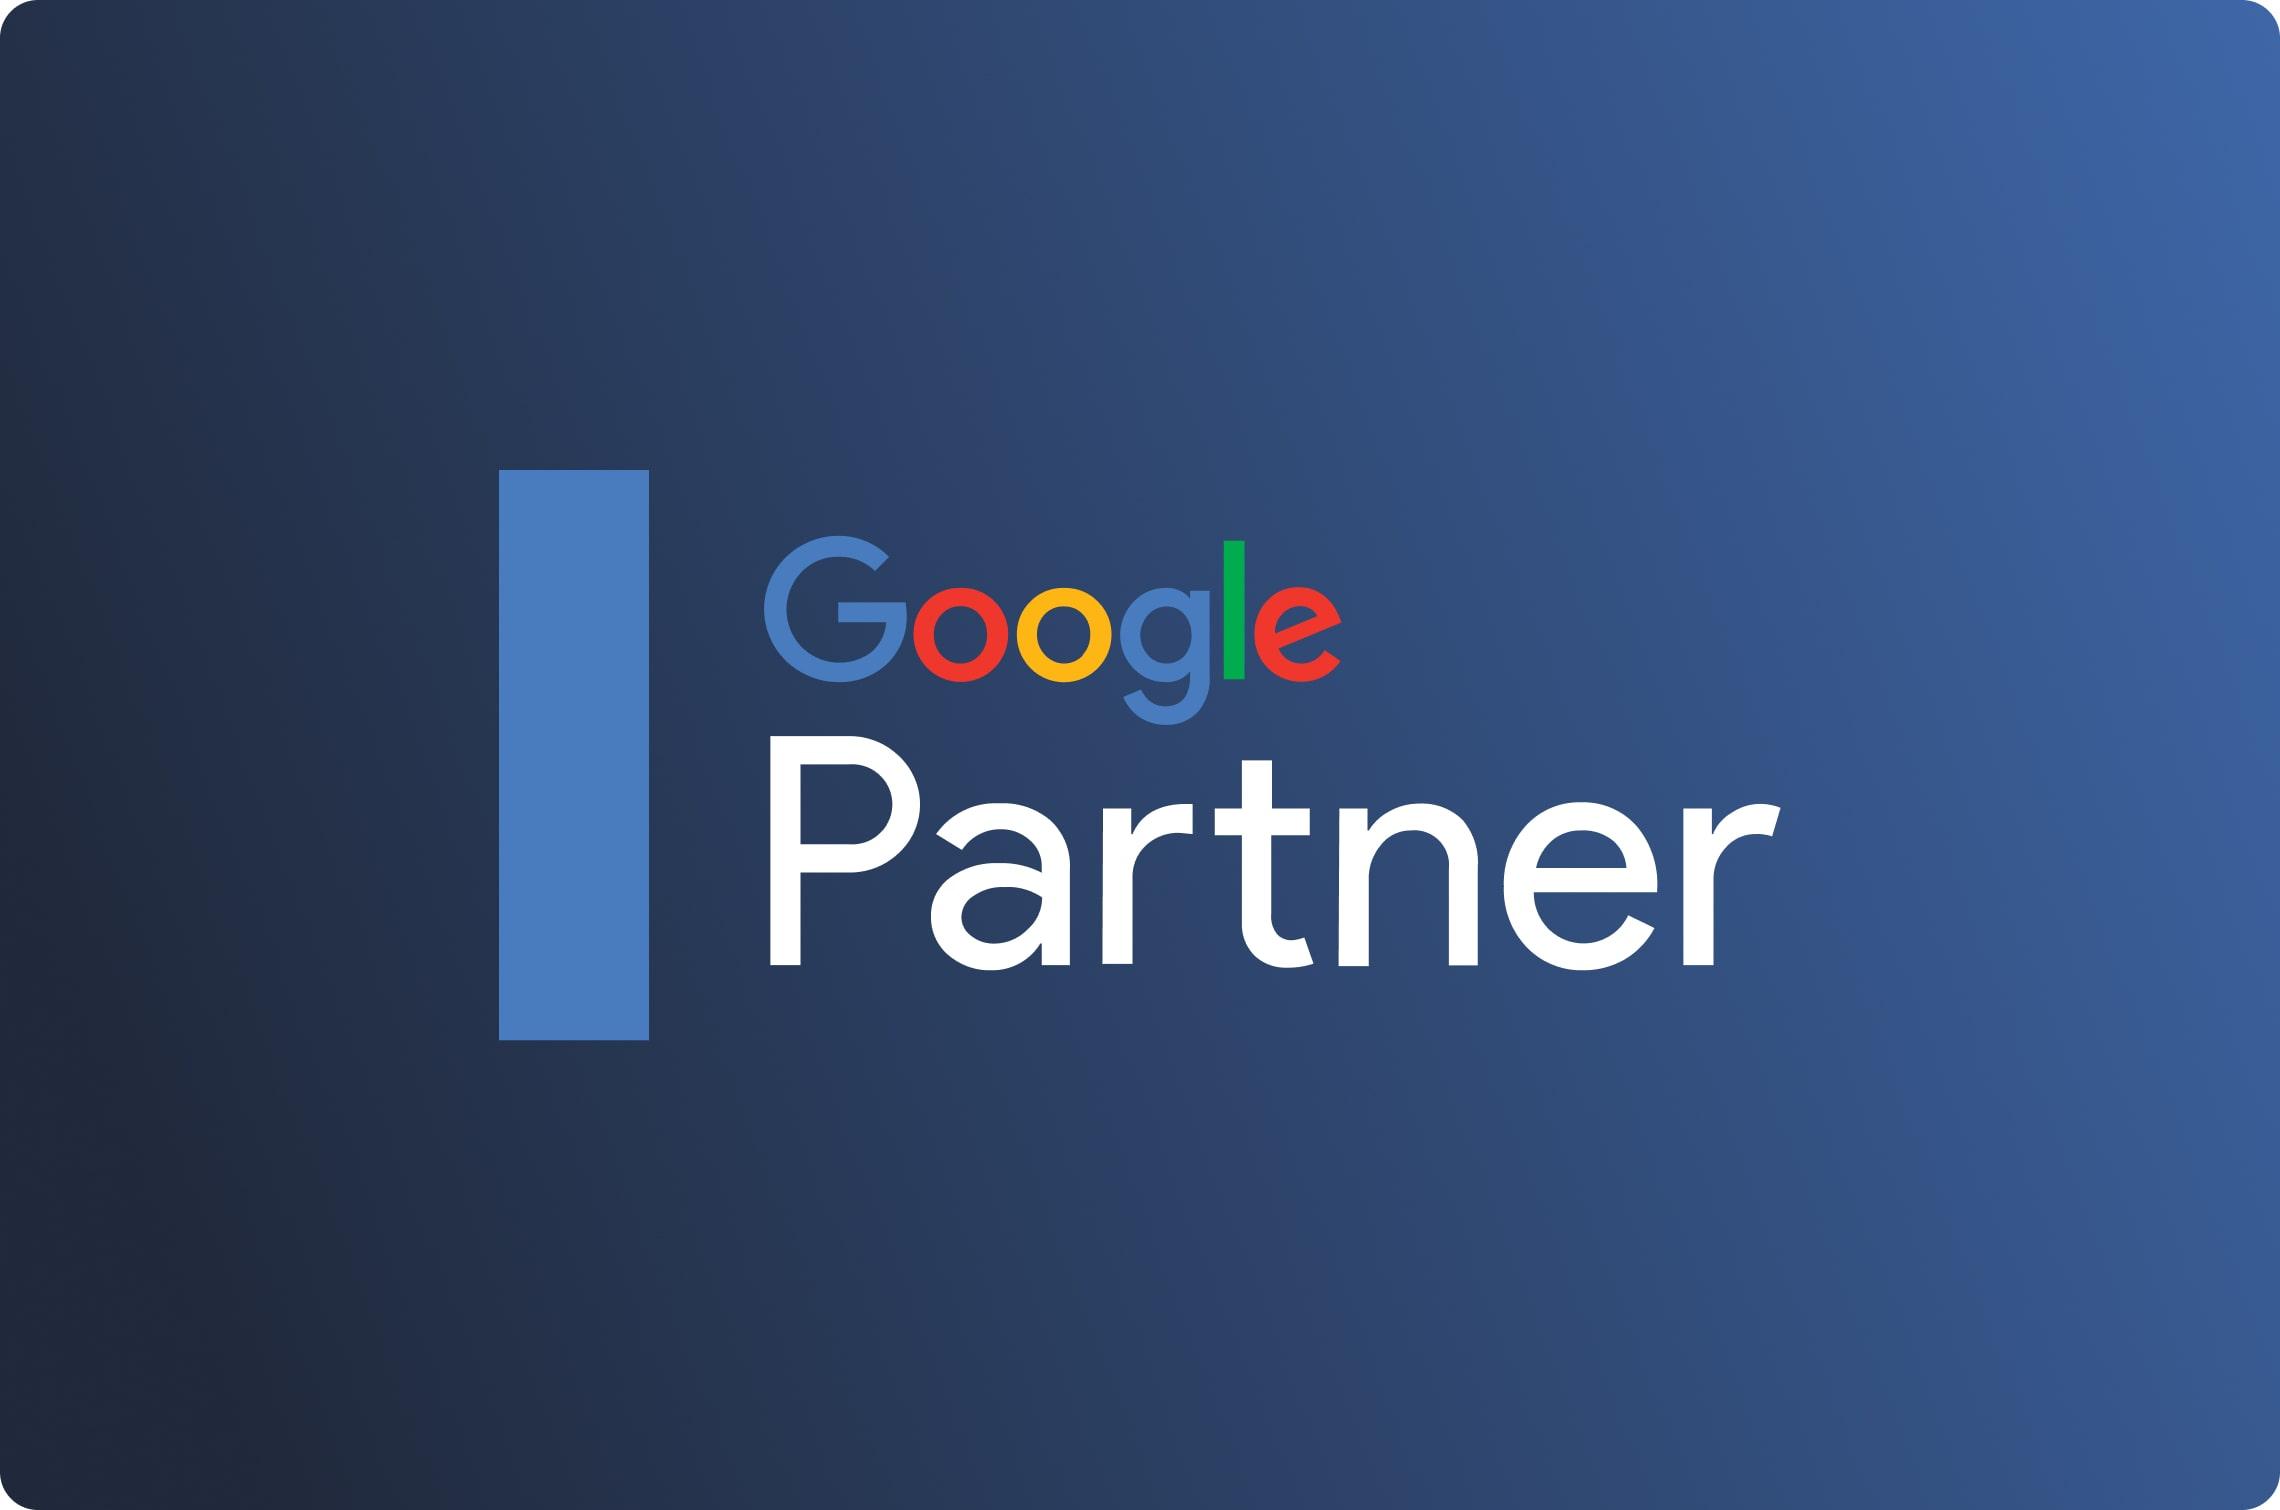 Dataddo is an Official Google Analytics Partner